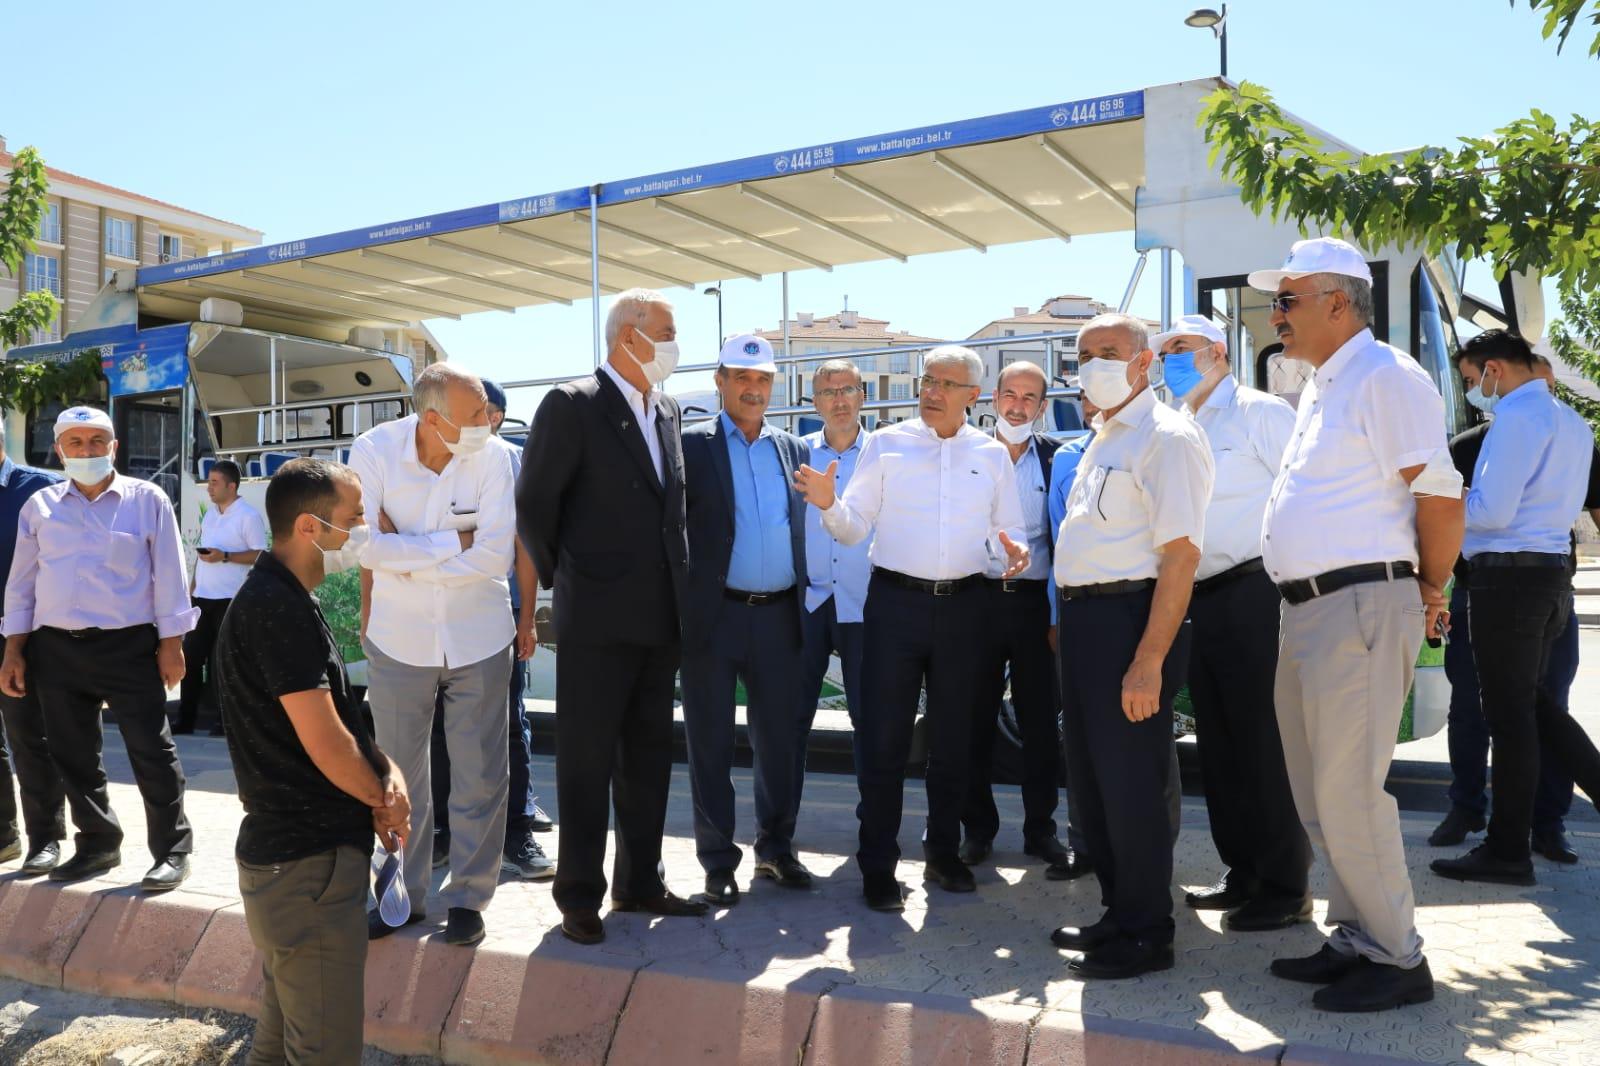 STK TEMSİLCİLERİ BATTALGAZİ'DEKİ YATIRIMLARI GEZDİ